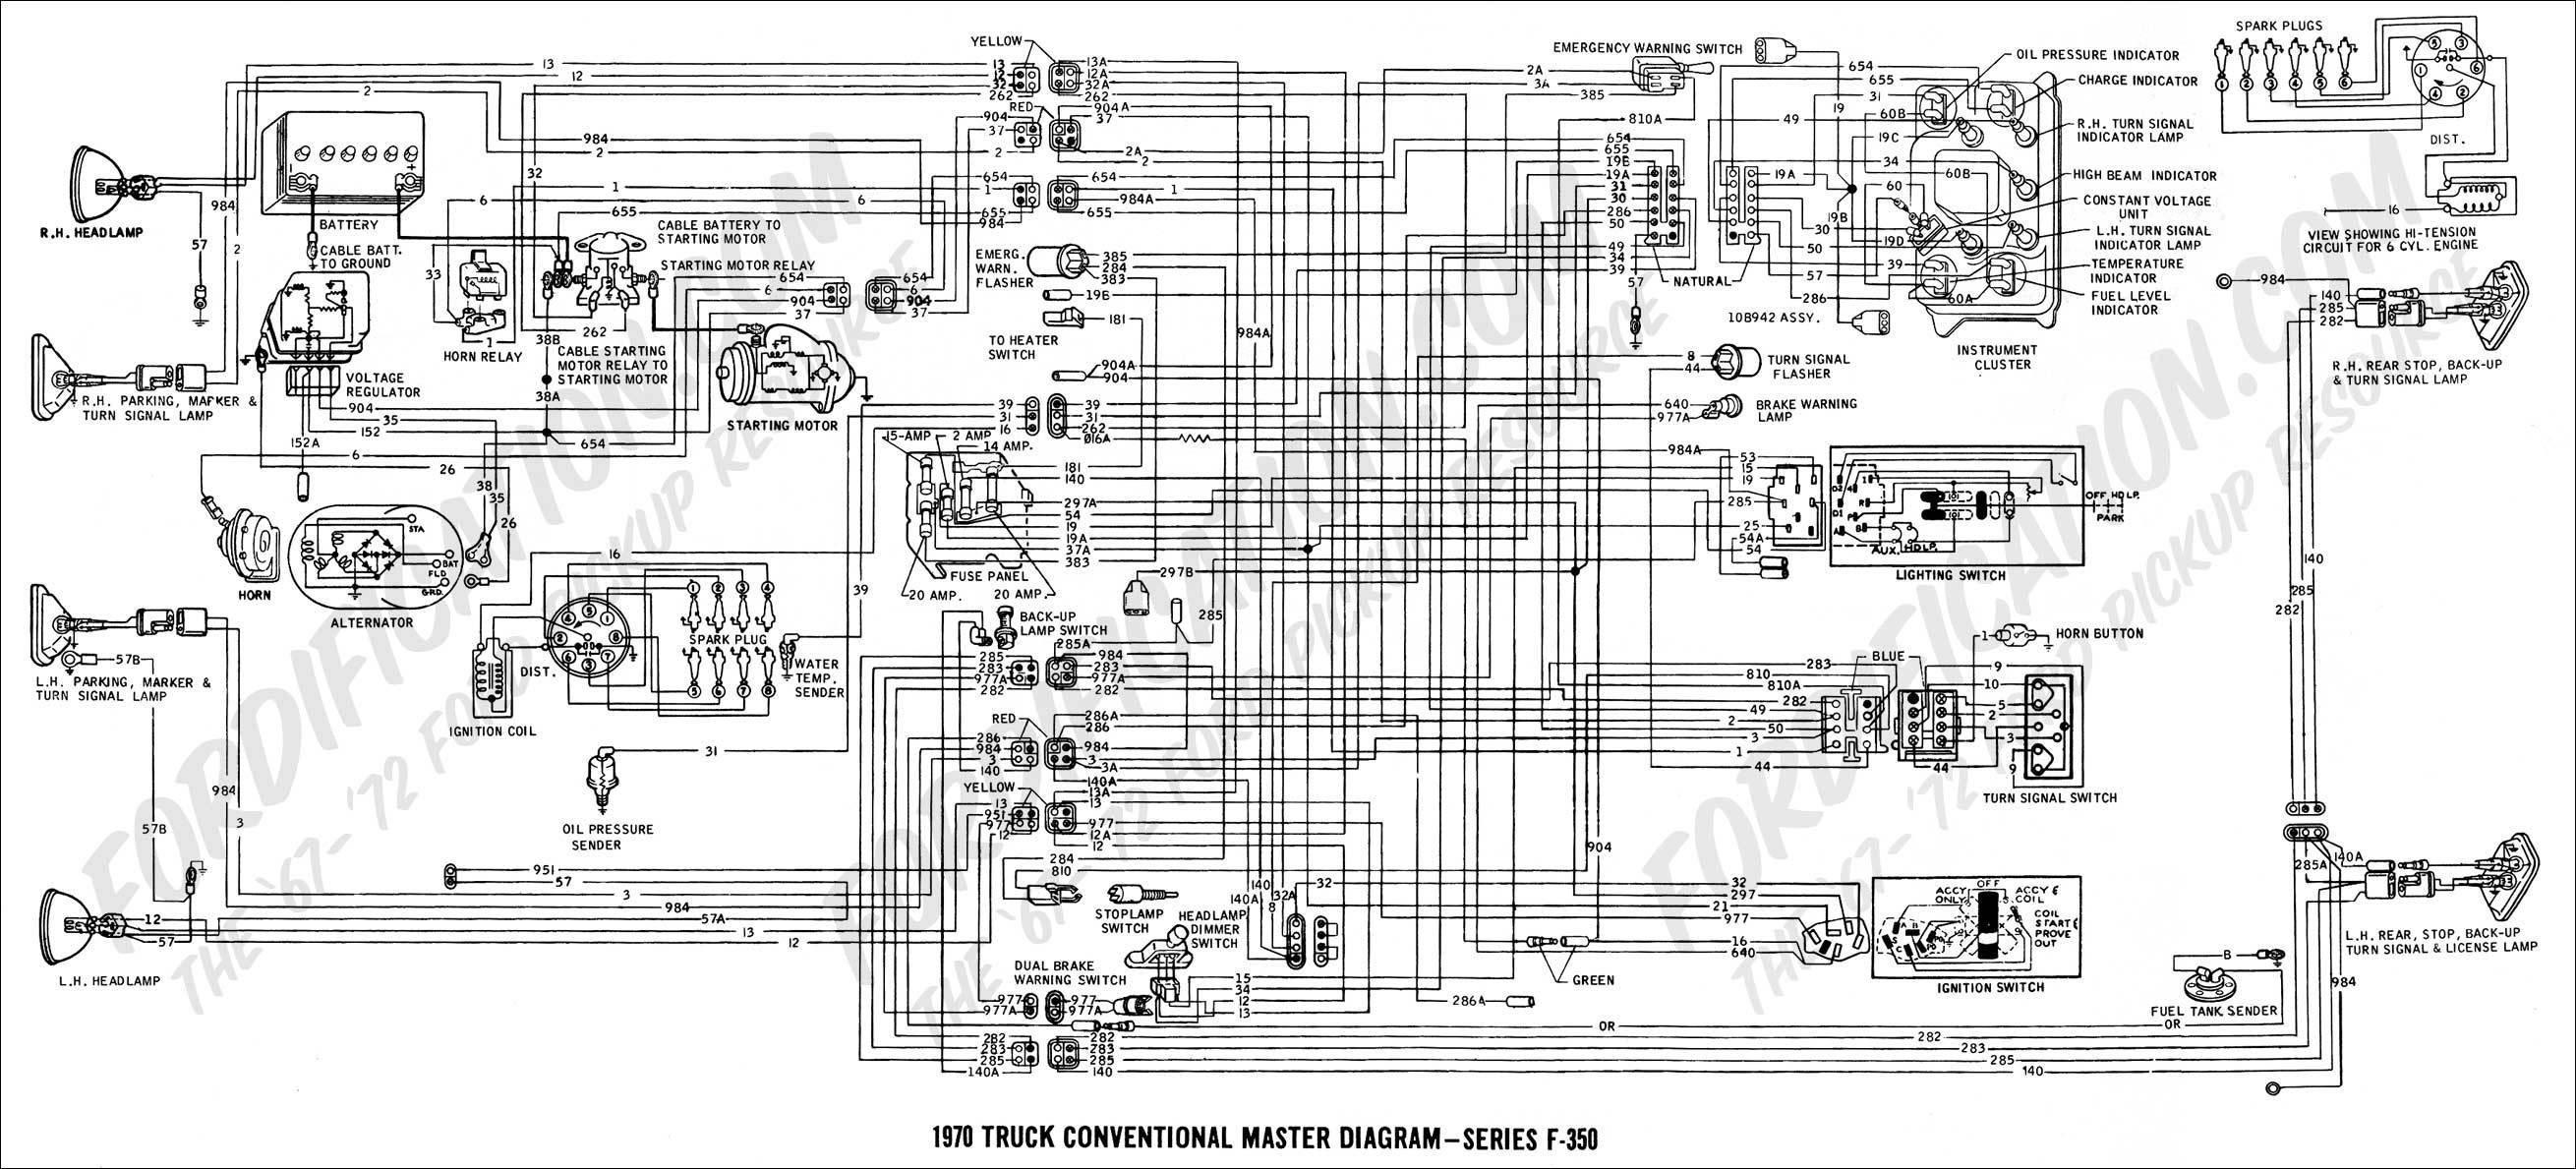 Powerstroke Engine Diagram Powerstroke Sel Engine Diagram Wiring Diagram Used Of Powerstroke Engine Diagram on Kenworth T800 Rear Suspension Diagram